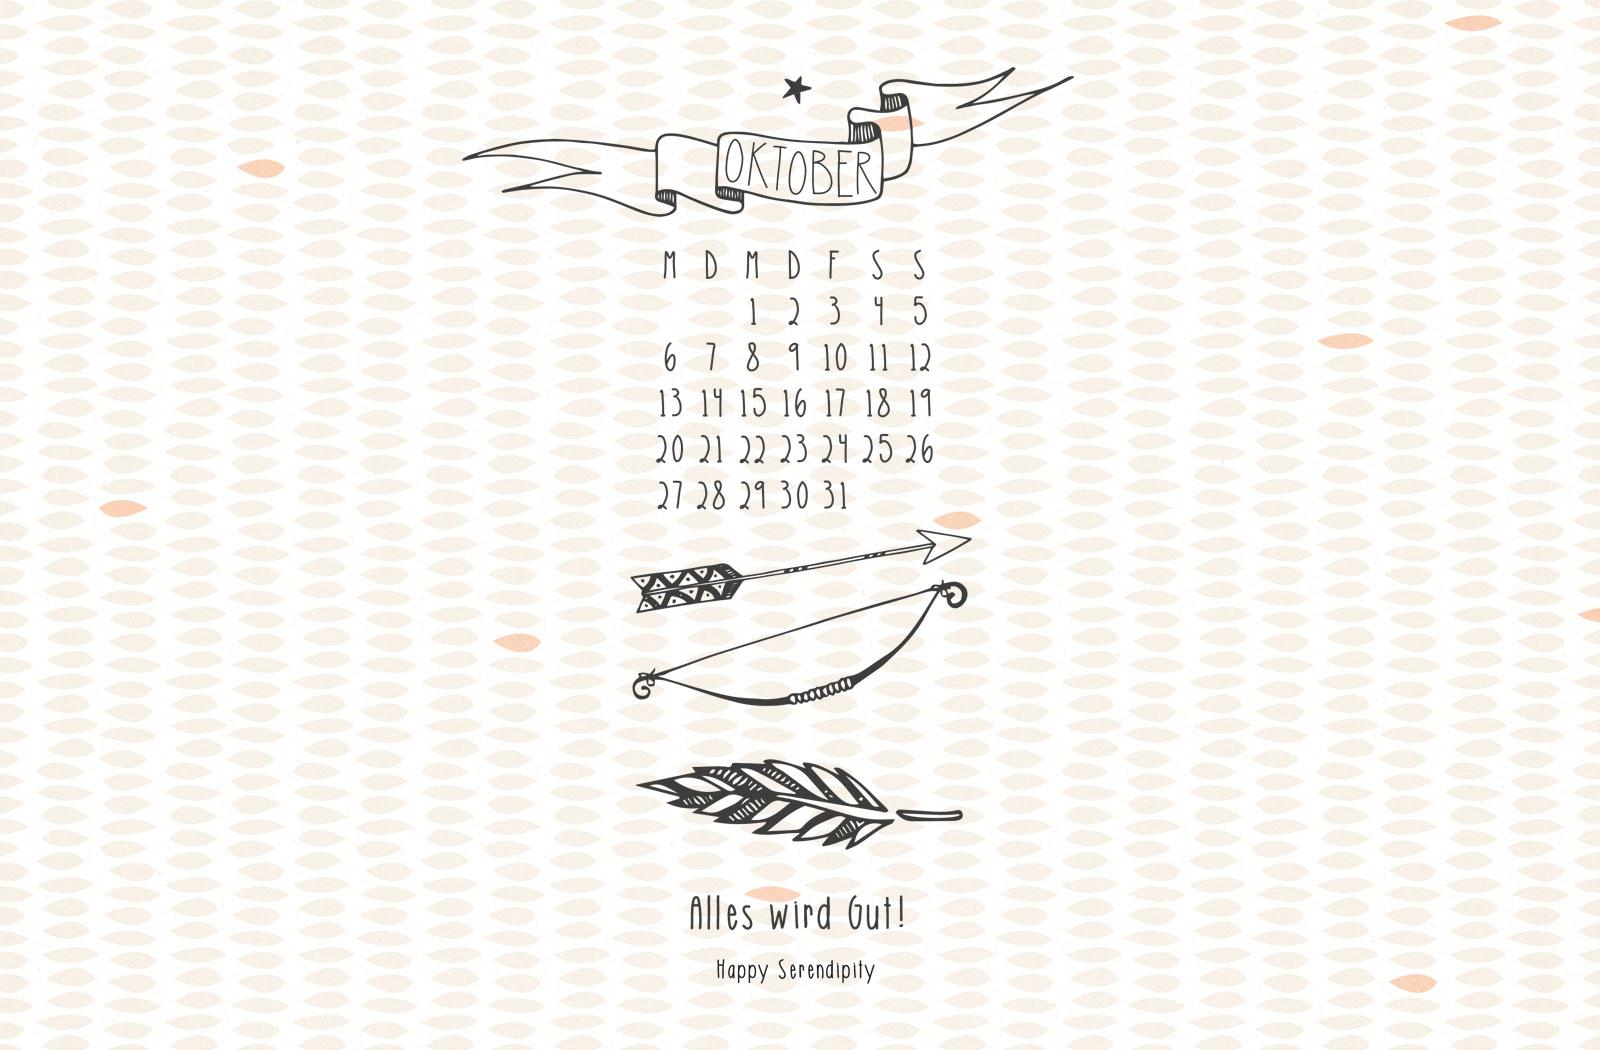 oktober-desktop-wallpaper-desktop-kalender-happyserendipity-1600x1050